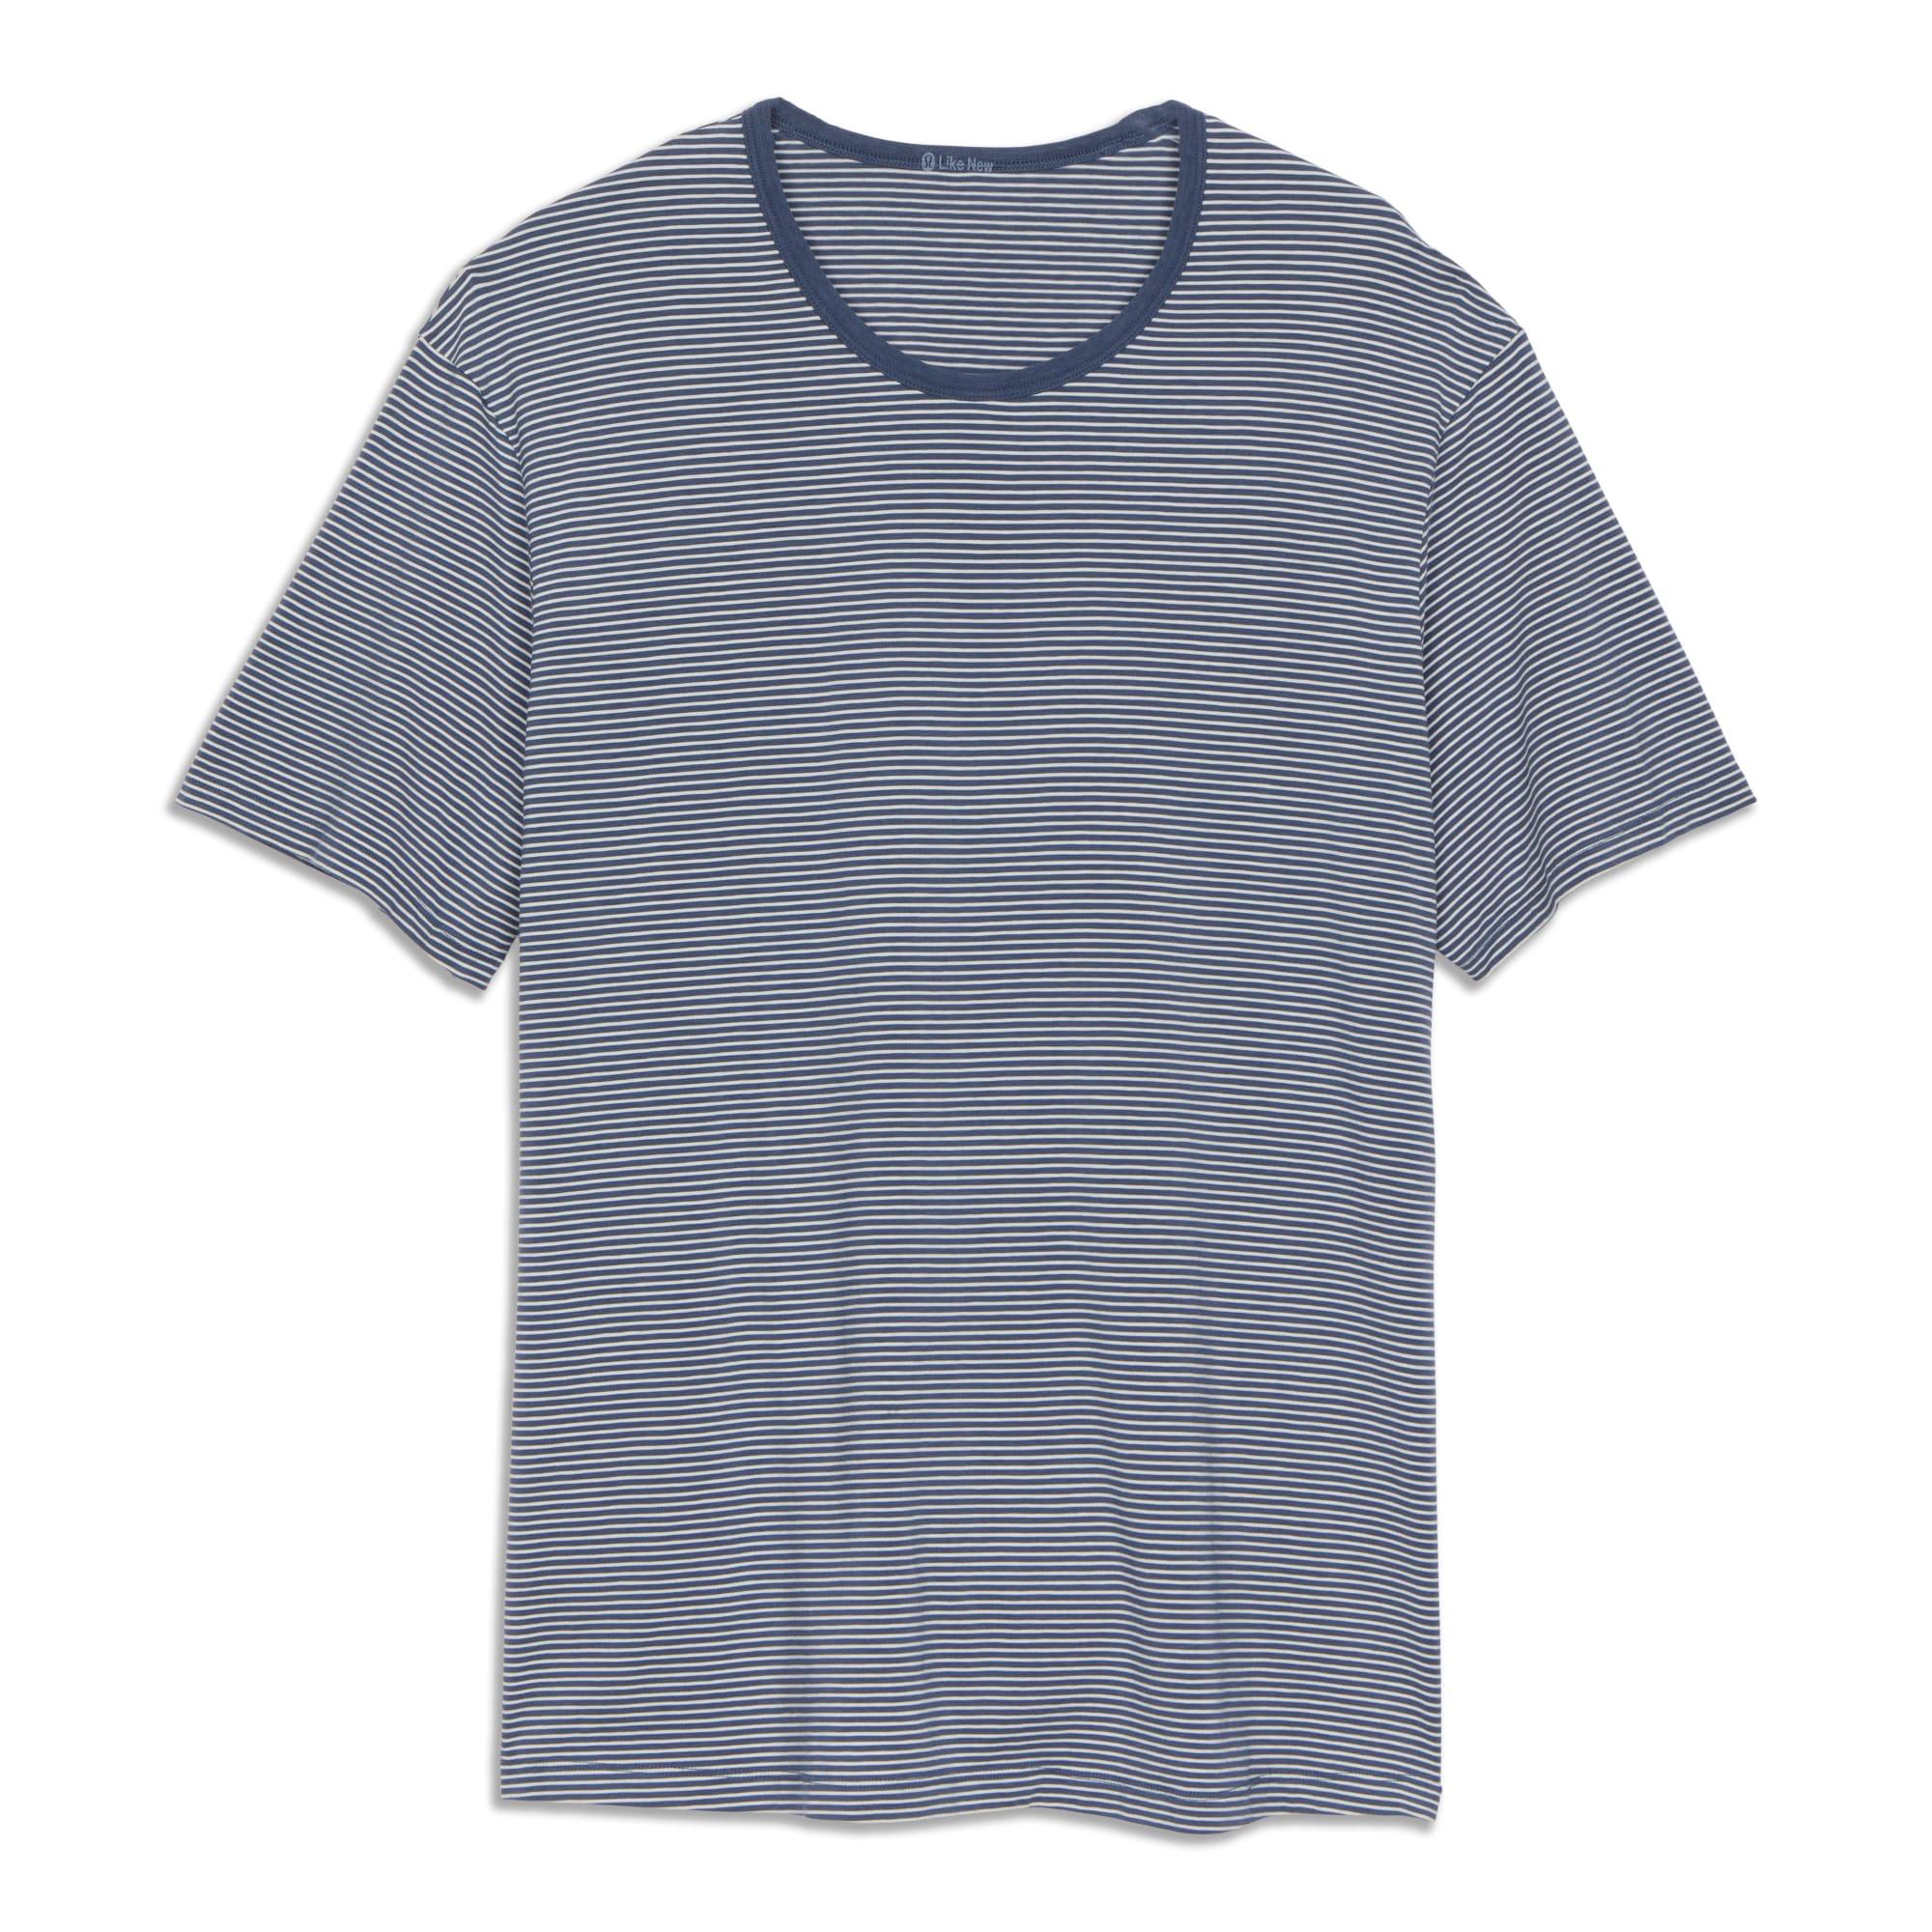 Main product image: 5 Year Basic T-Shirt - Resale